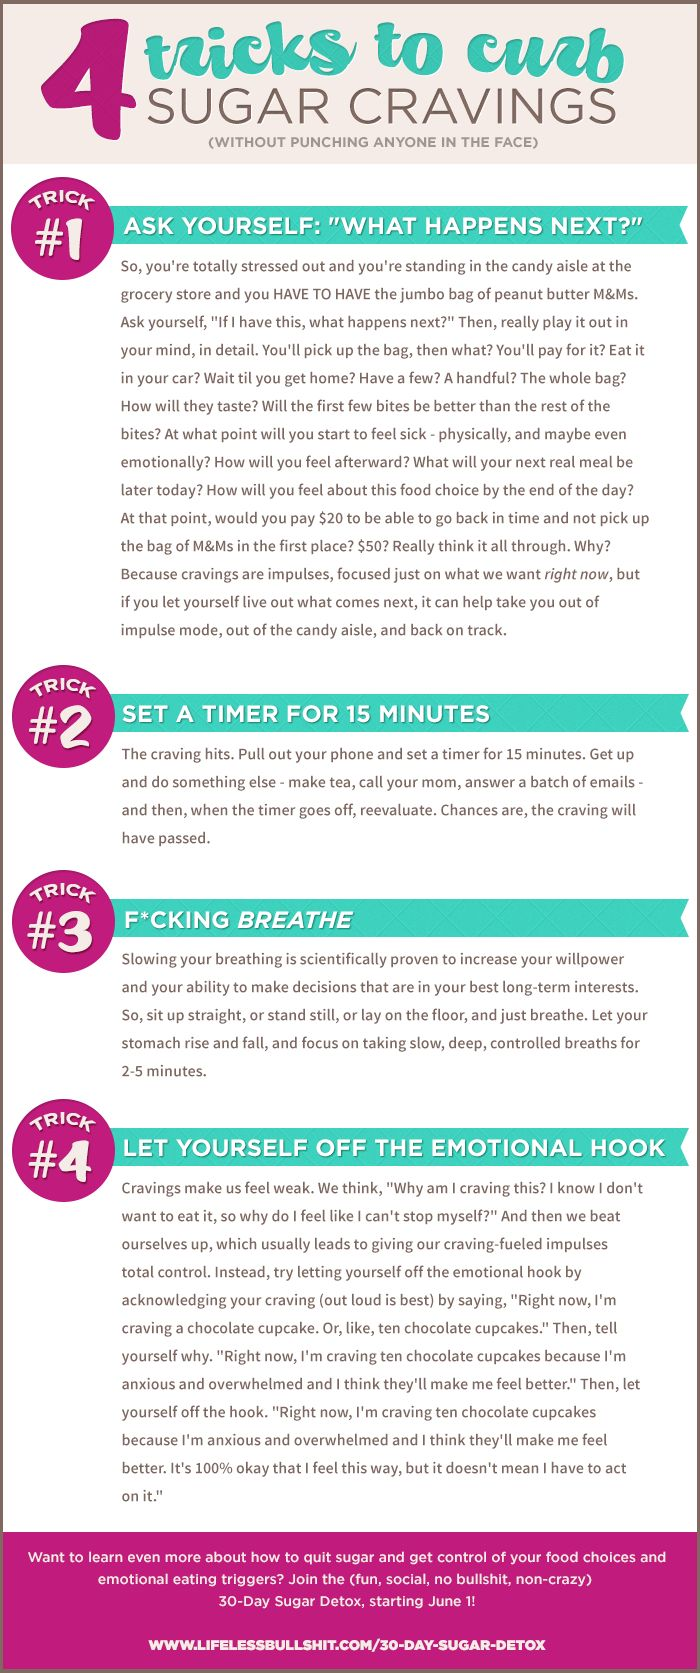 4 Tricks to Curb Sugar Cravings - from the 30-Day Sugar Detox --> http://www.lifelessbullshit.com/30-day-sugar-detox/